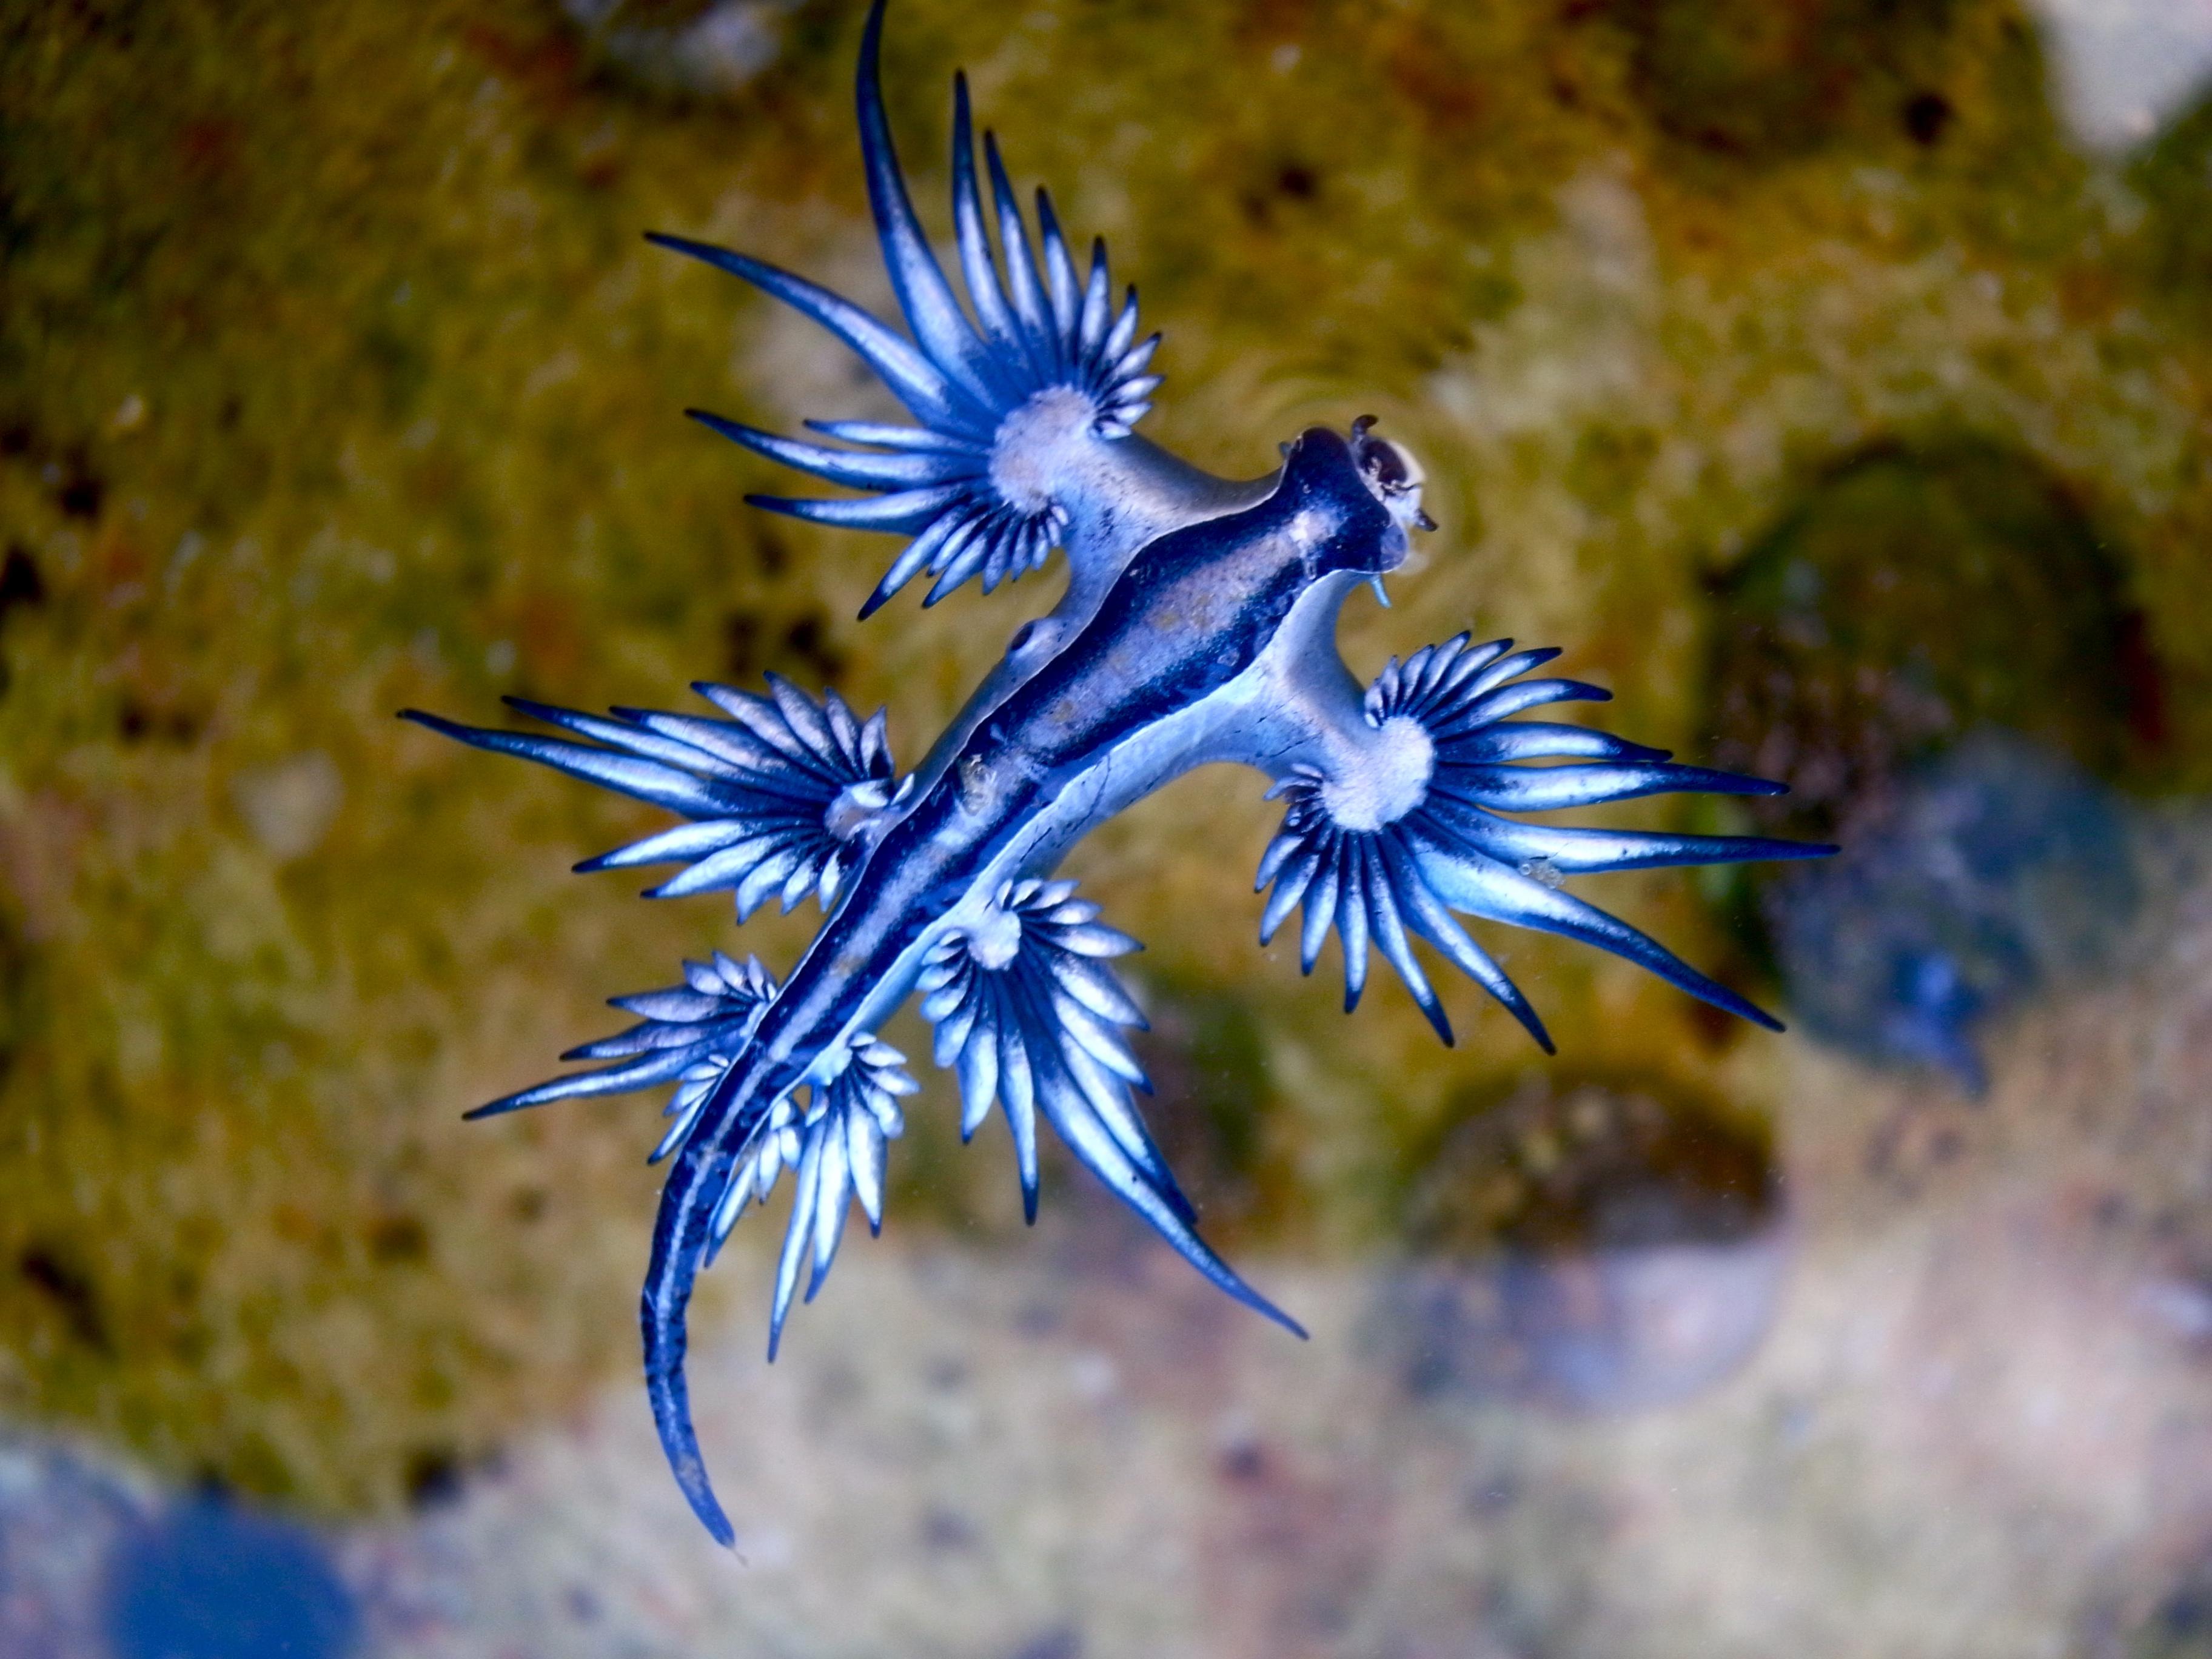 blue sea slug Find great deals on ebay for blue dragon sea slug shop with confidence.